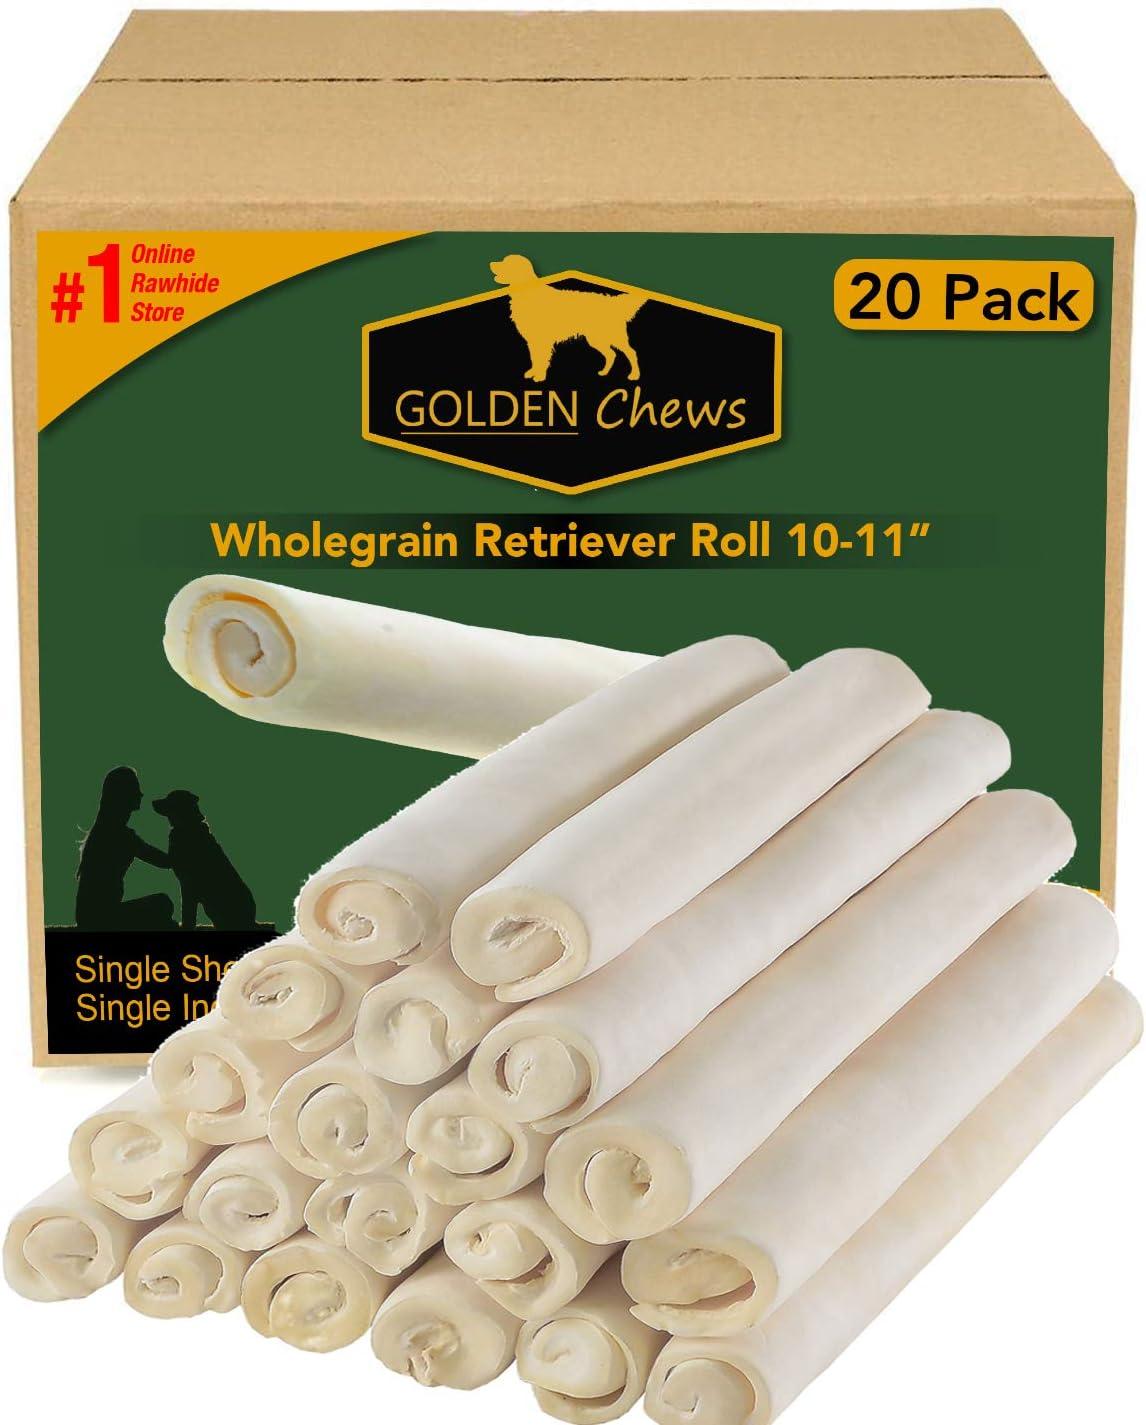 Price reduction Golden Chews Premium Wholegrain Rawhide Roll Pack inch In stock 20 10-11